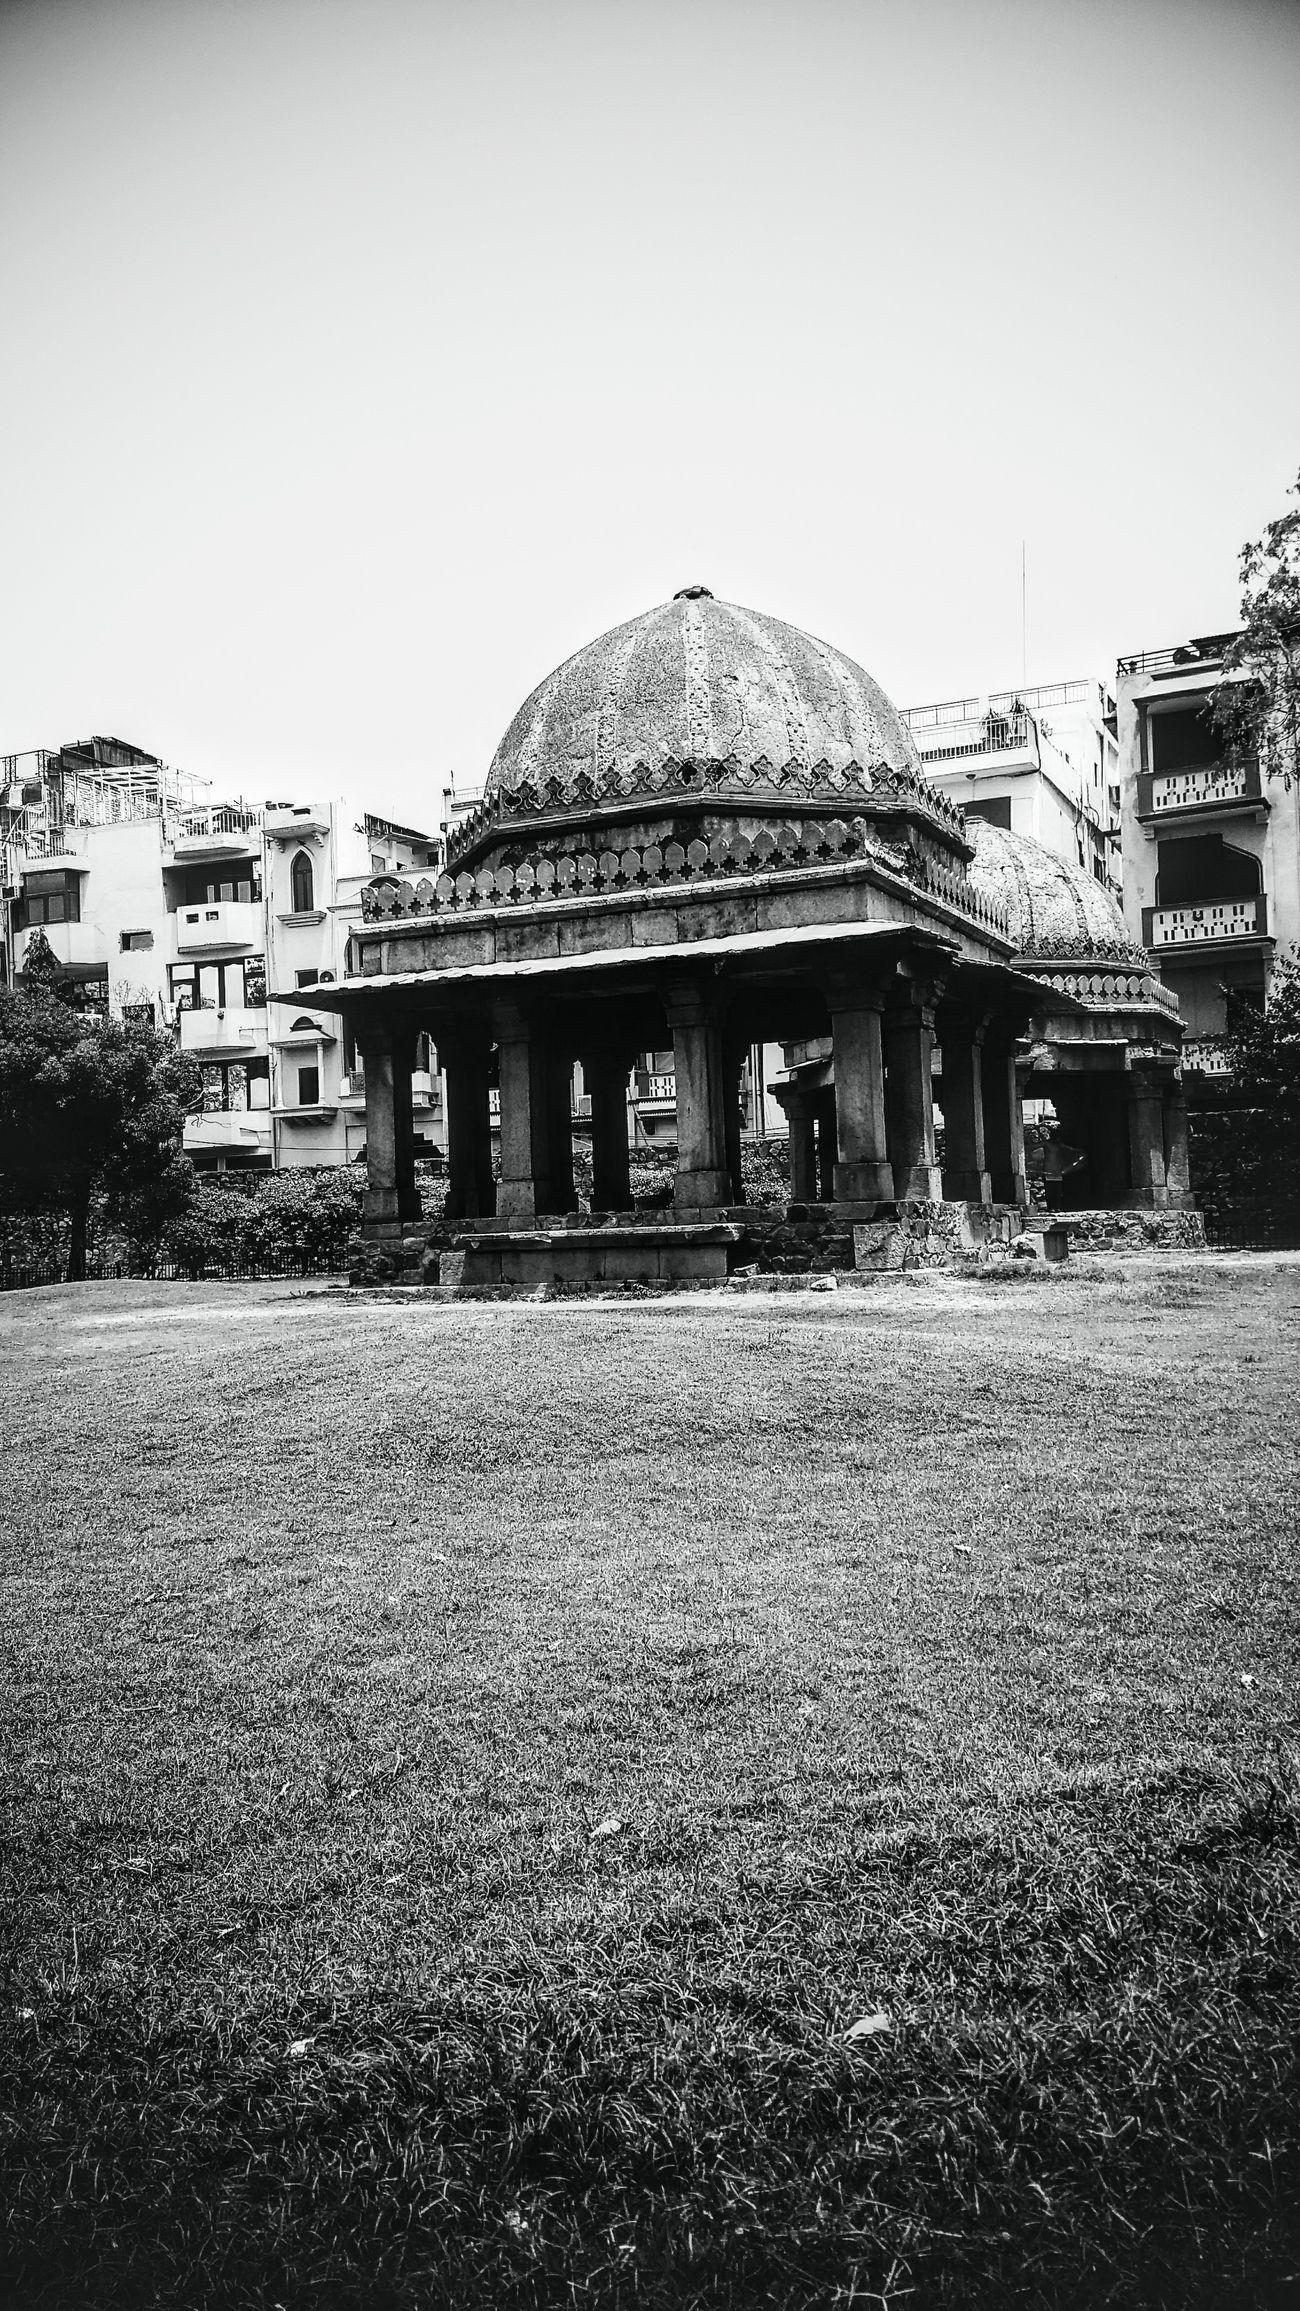 Outdoors Architecture India Delhidiaries Hauzkhasvillage The Architect - 2017 EyeEm Awards The Street Photographer - 2017 EyeEm Awards VSCO Blackandwhite_streetphotography